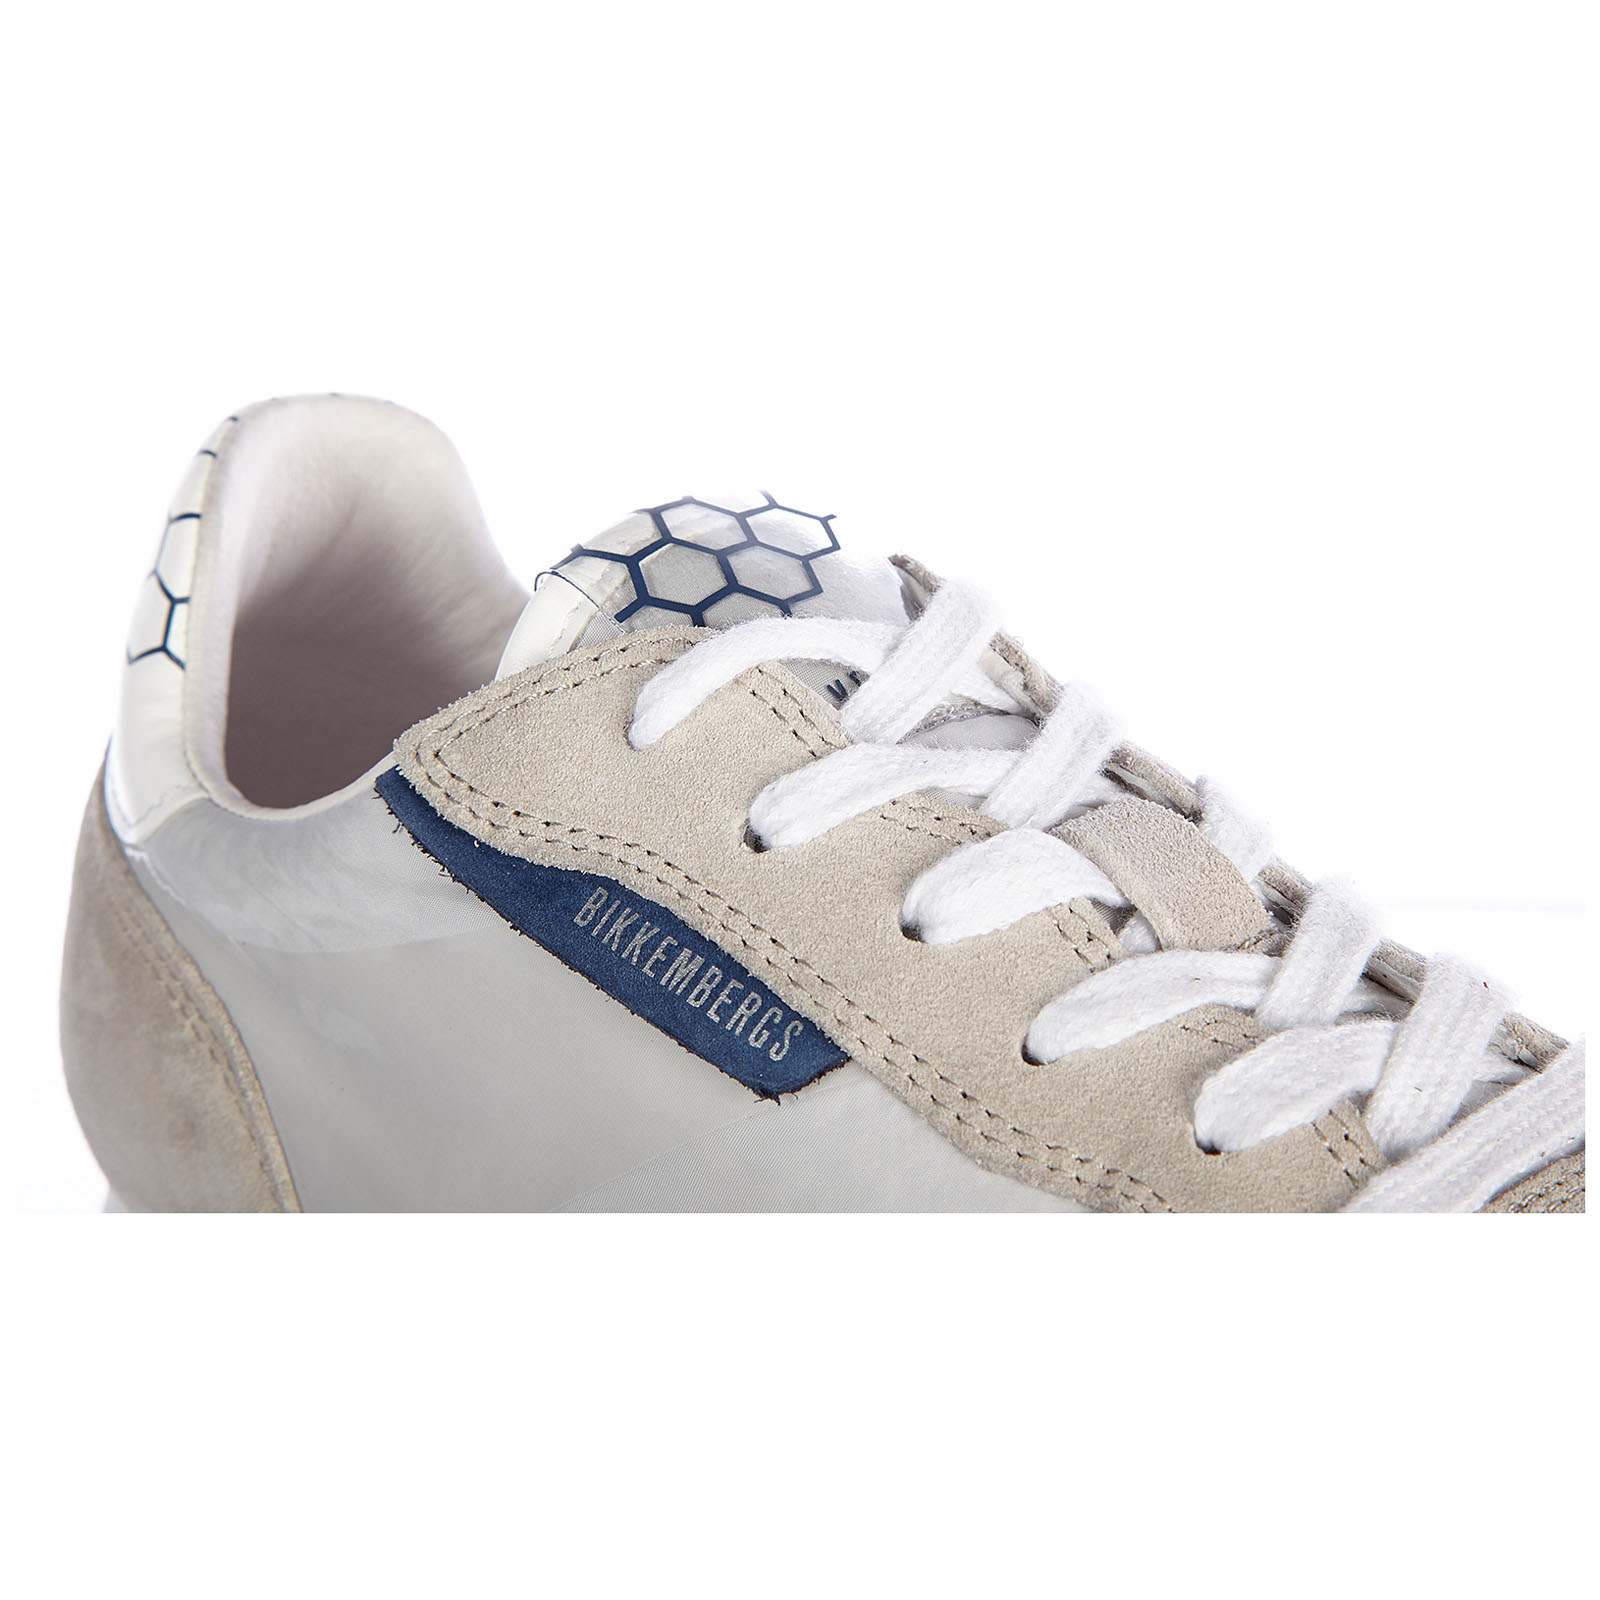 Men's shoes suede trainers sneakers endurance vintage